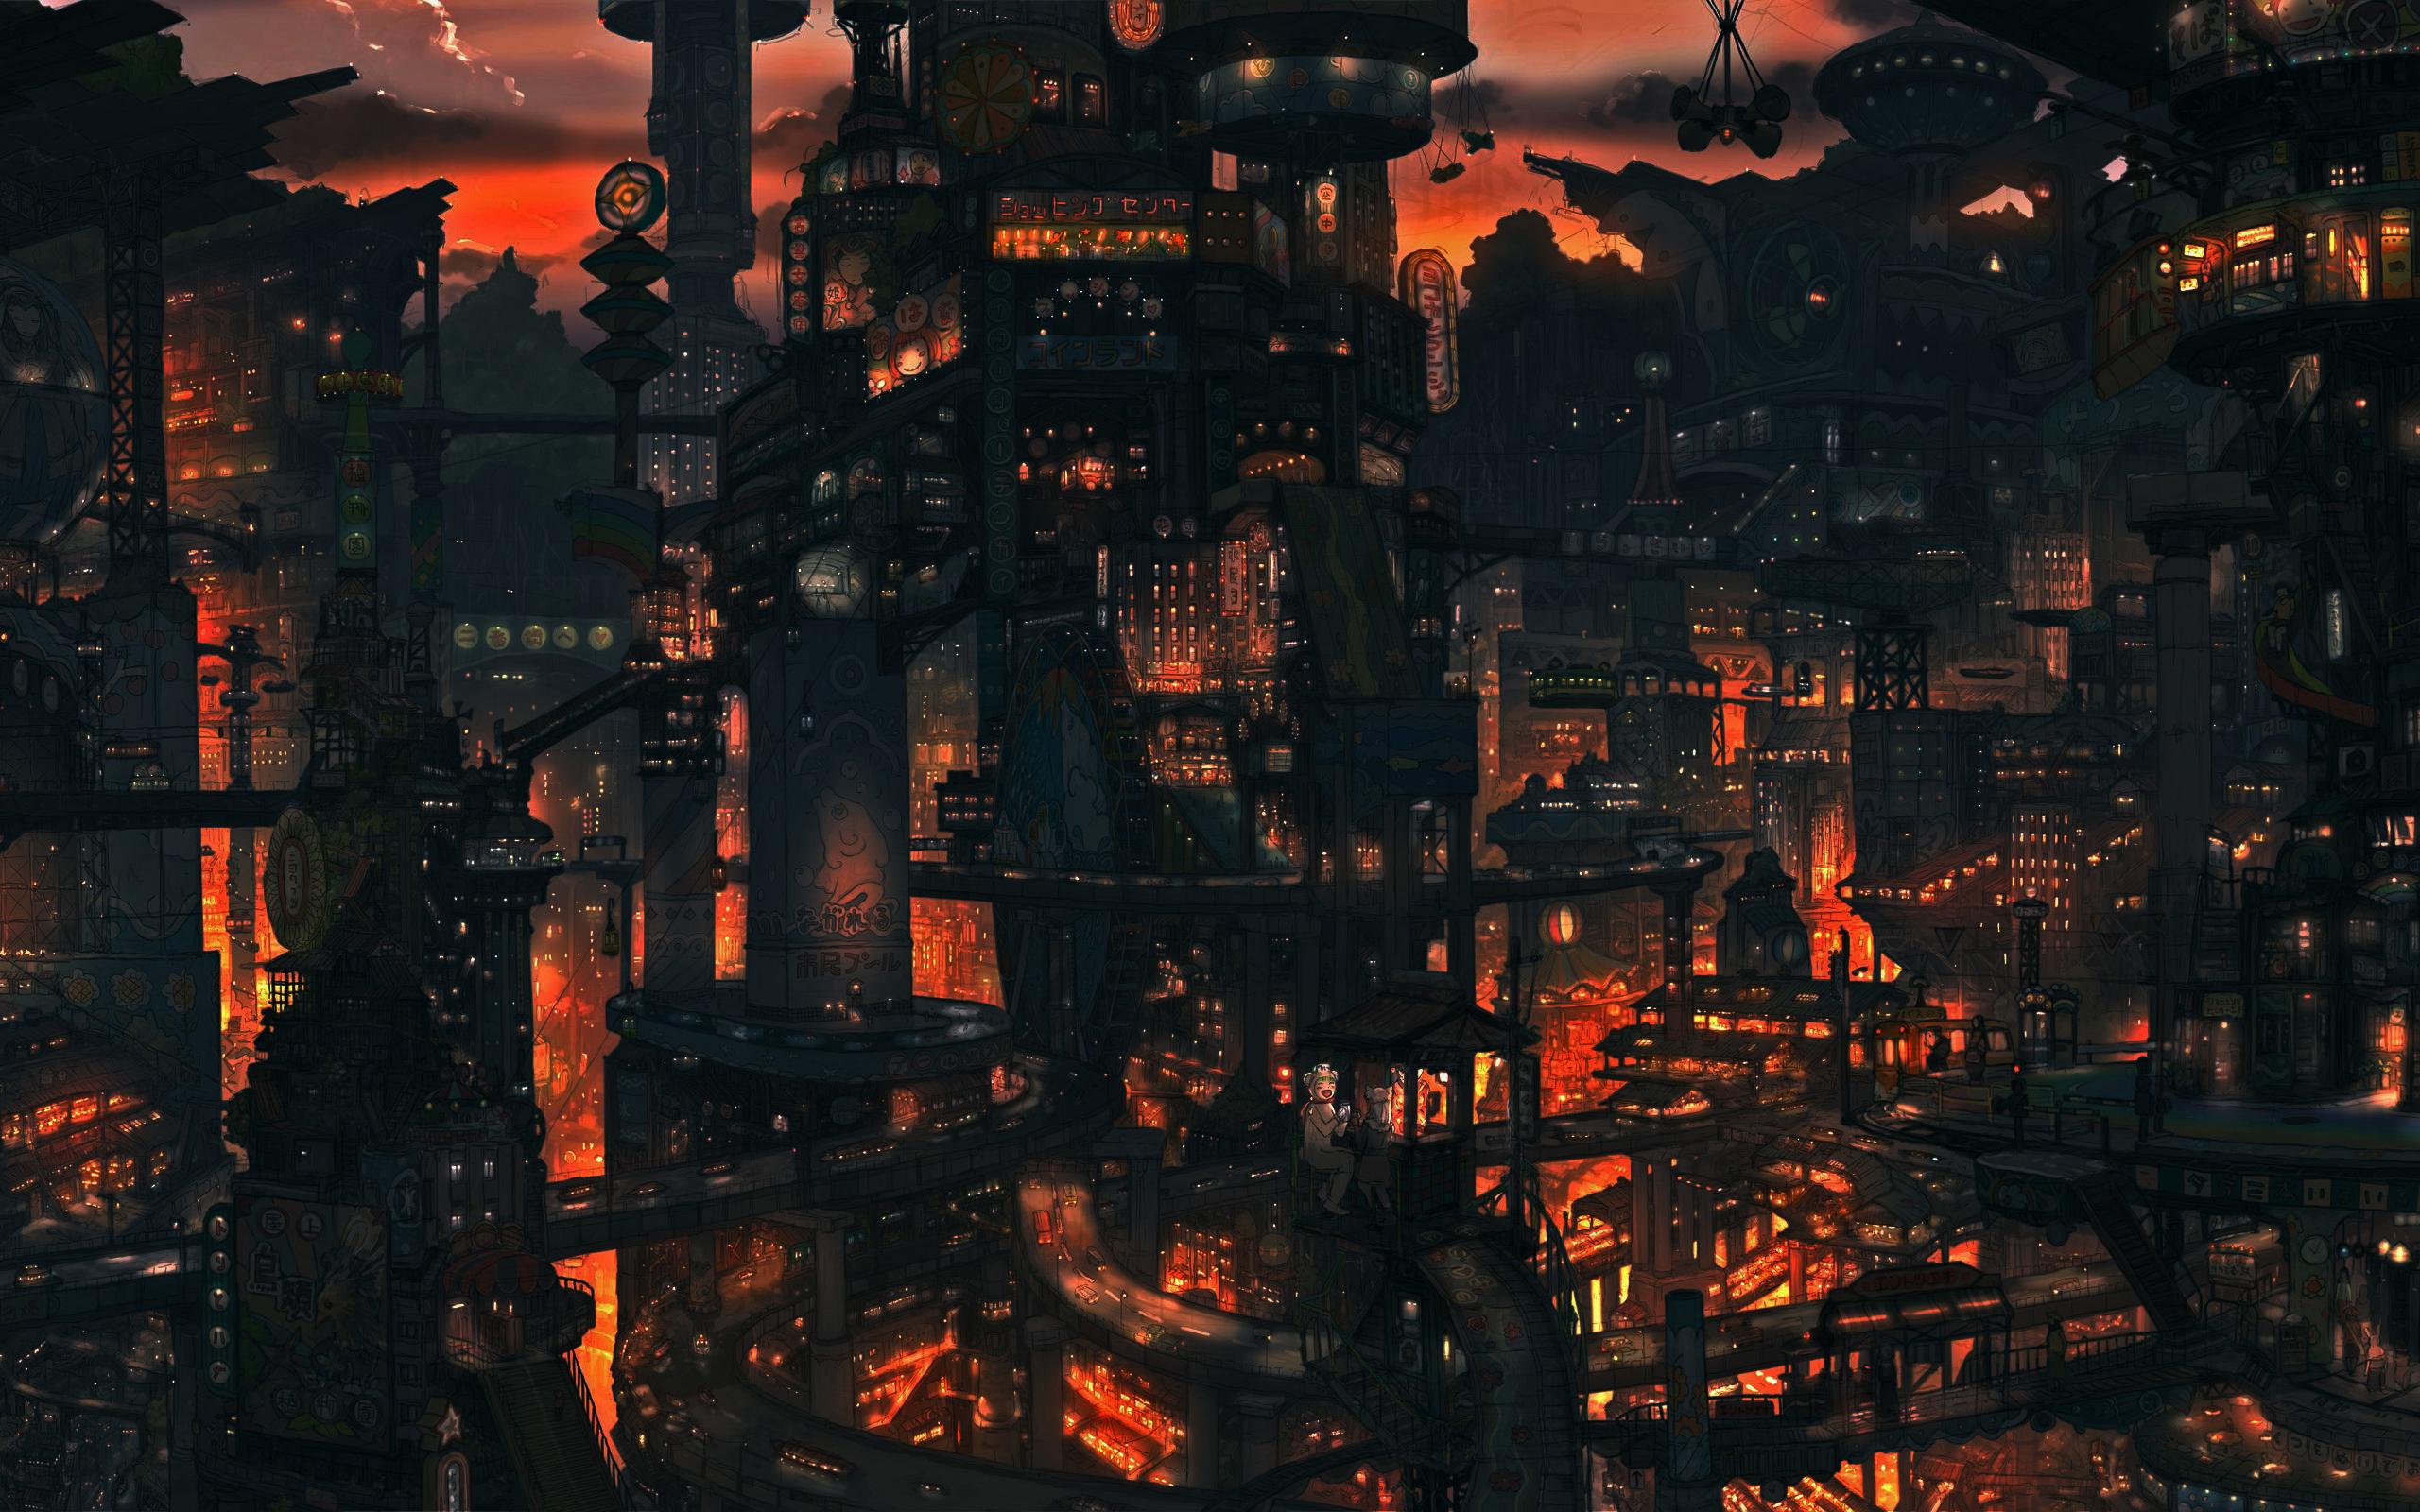 Wonderful Wallpaper Minecraft Steampunk - city4-wallpaper-588272  Trends_685216.jpg